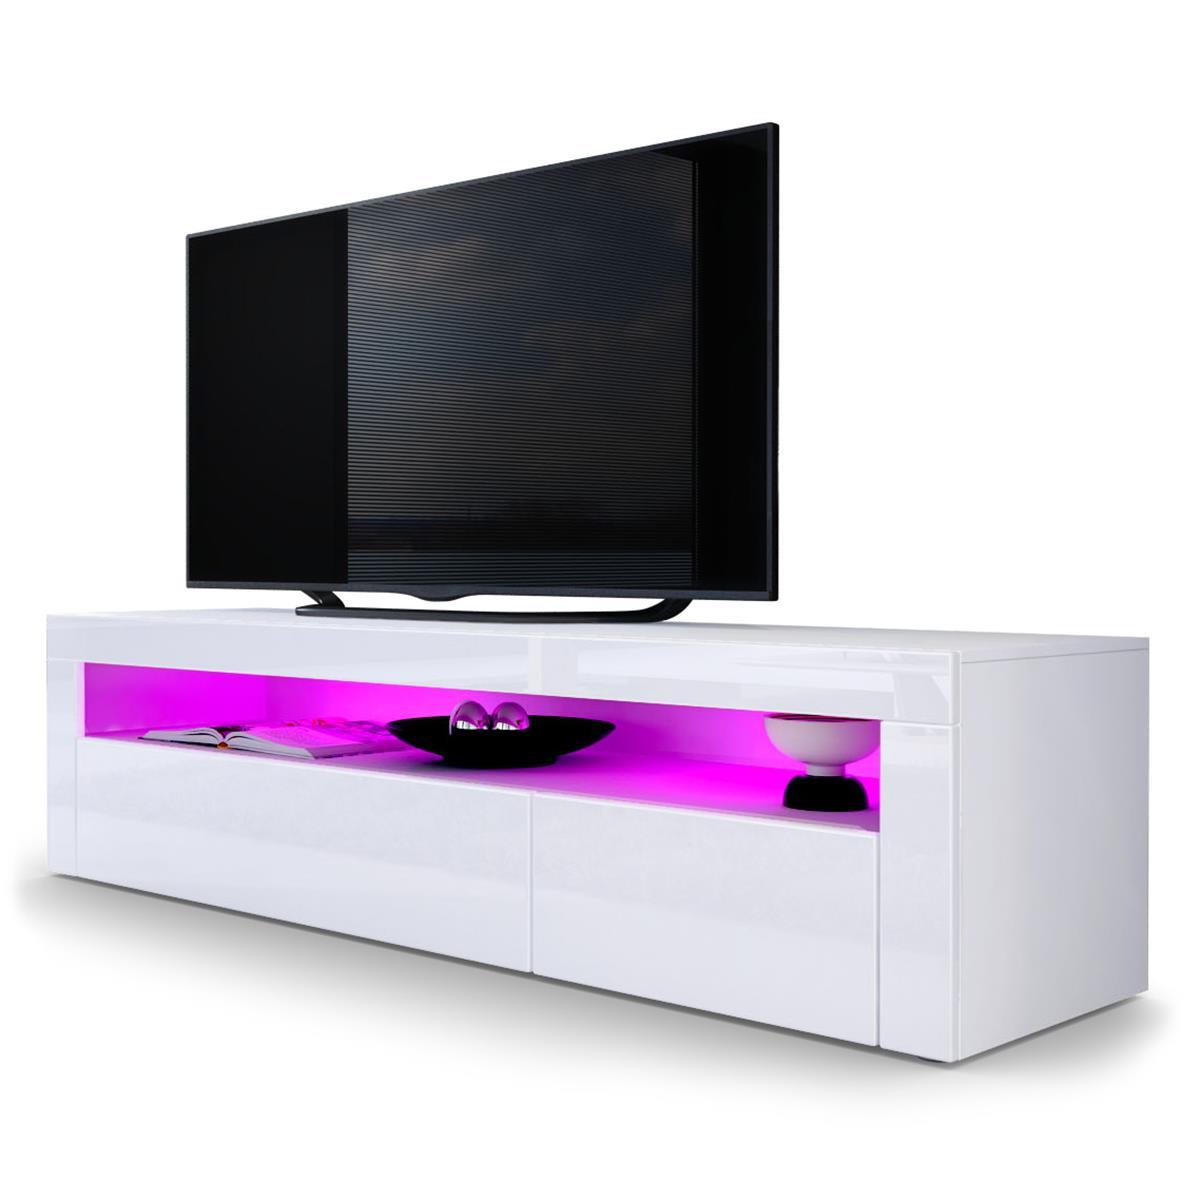 valencia lowboard 2 klappen und ger tefach f r hifizubeh r. Black Bedroom Furniture Sets. Home Design Ideas